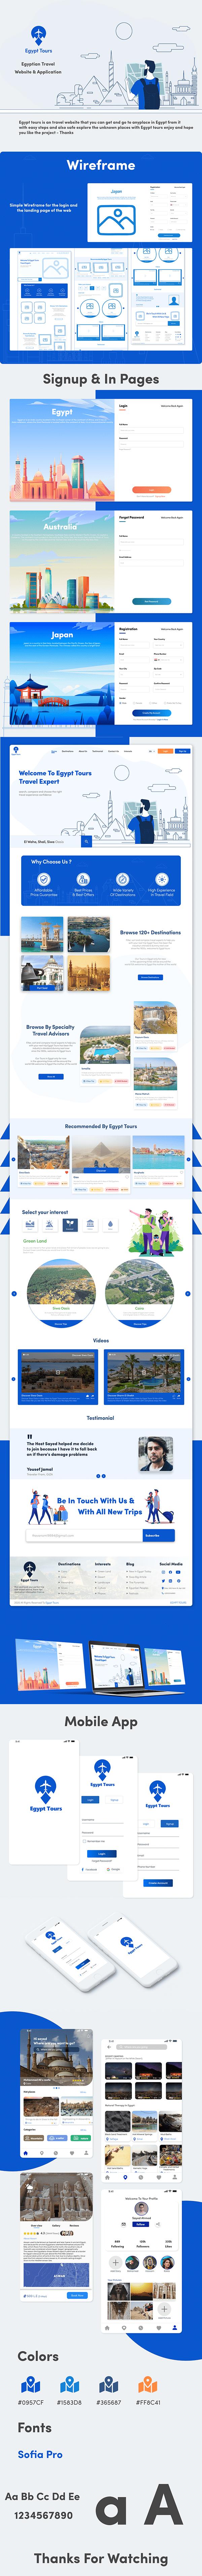 Egypt Tours | UI UX Web Design